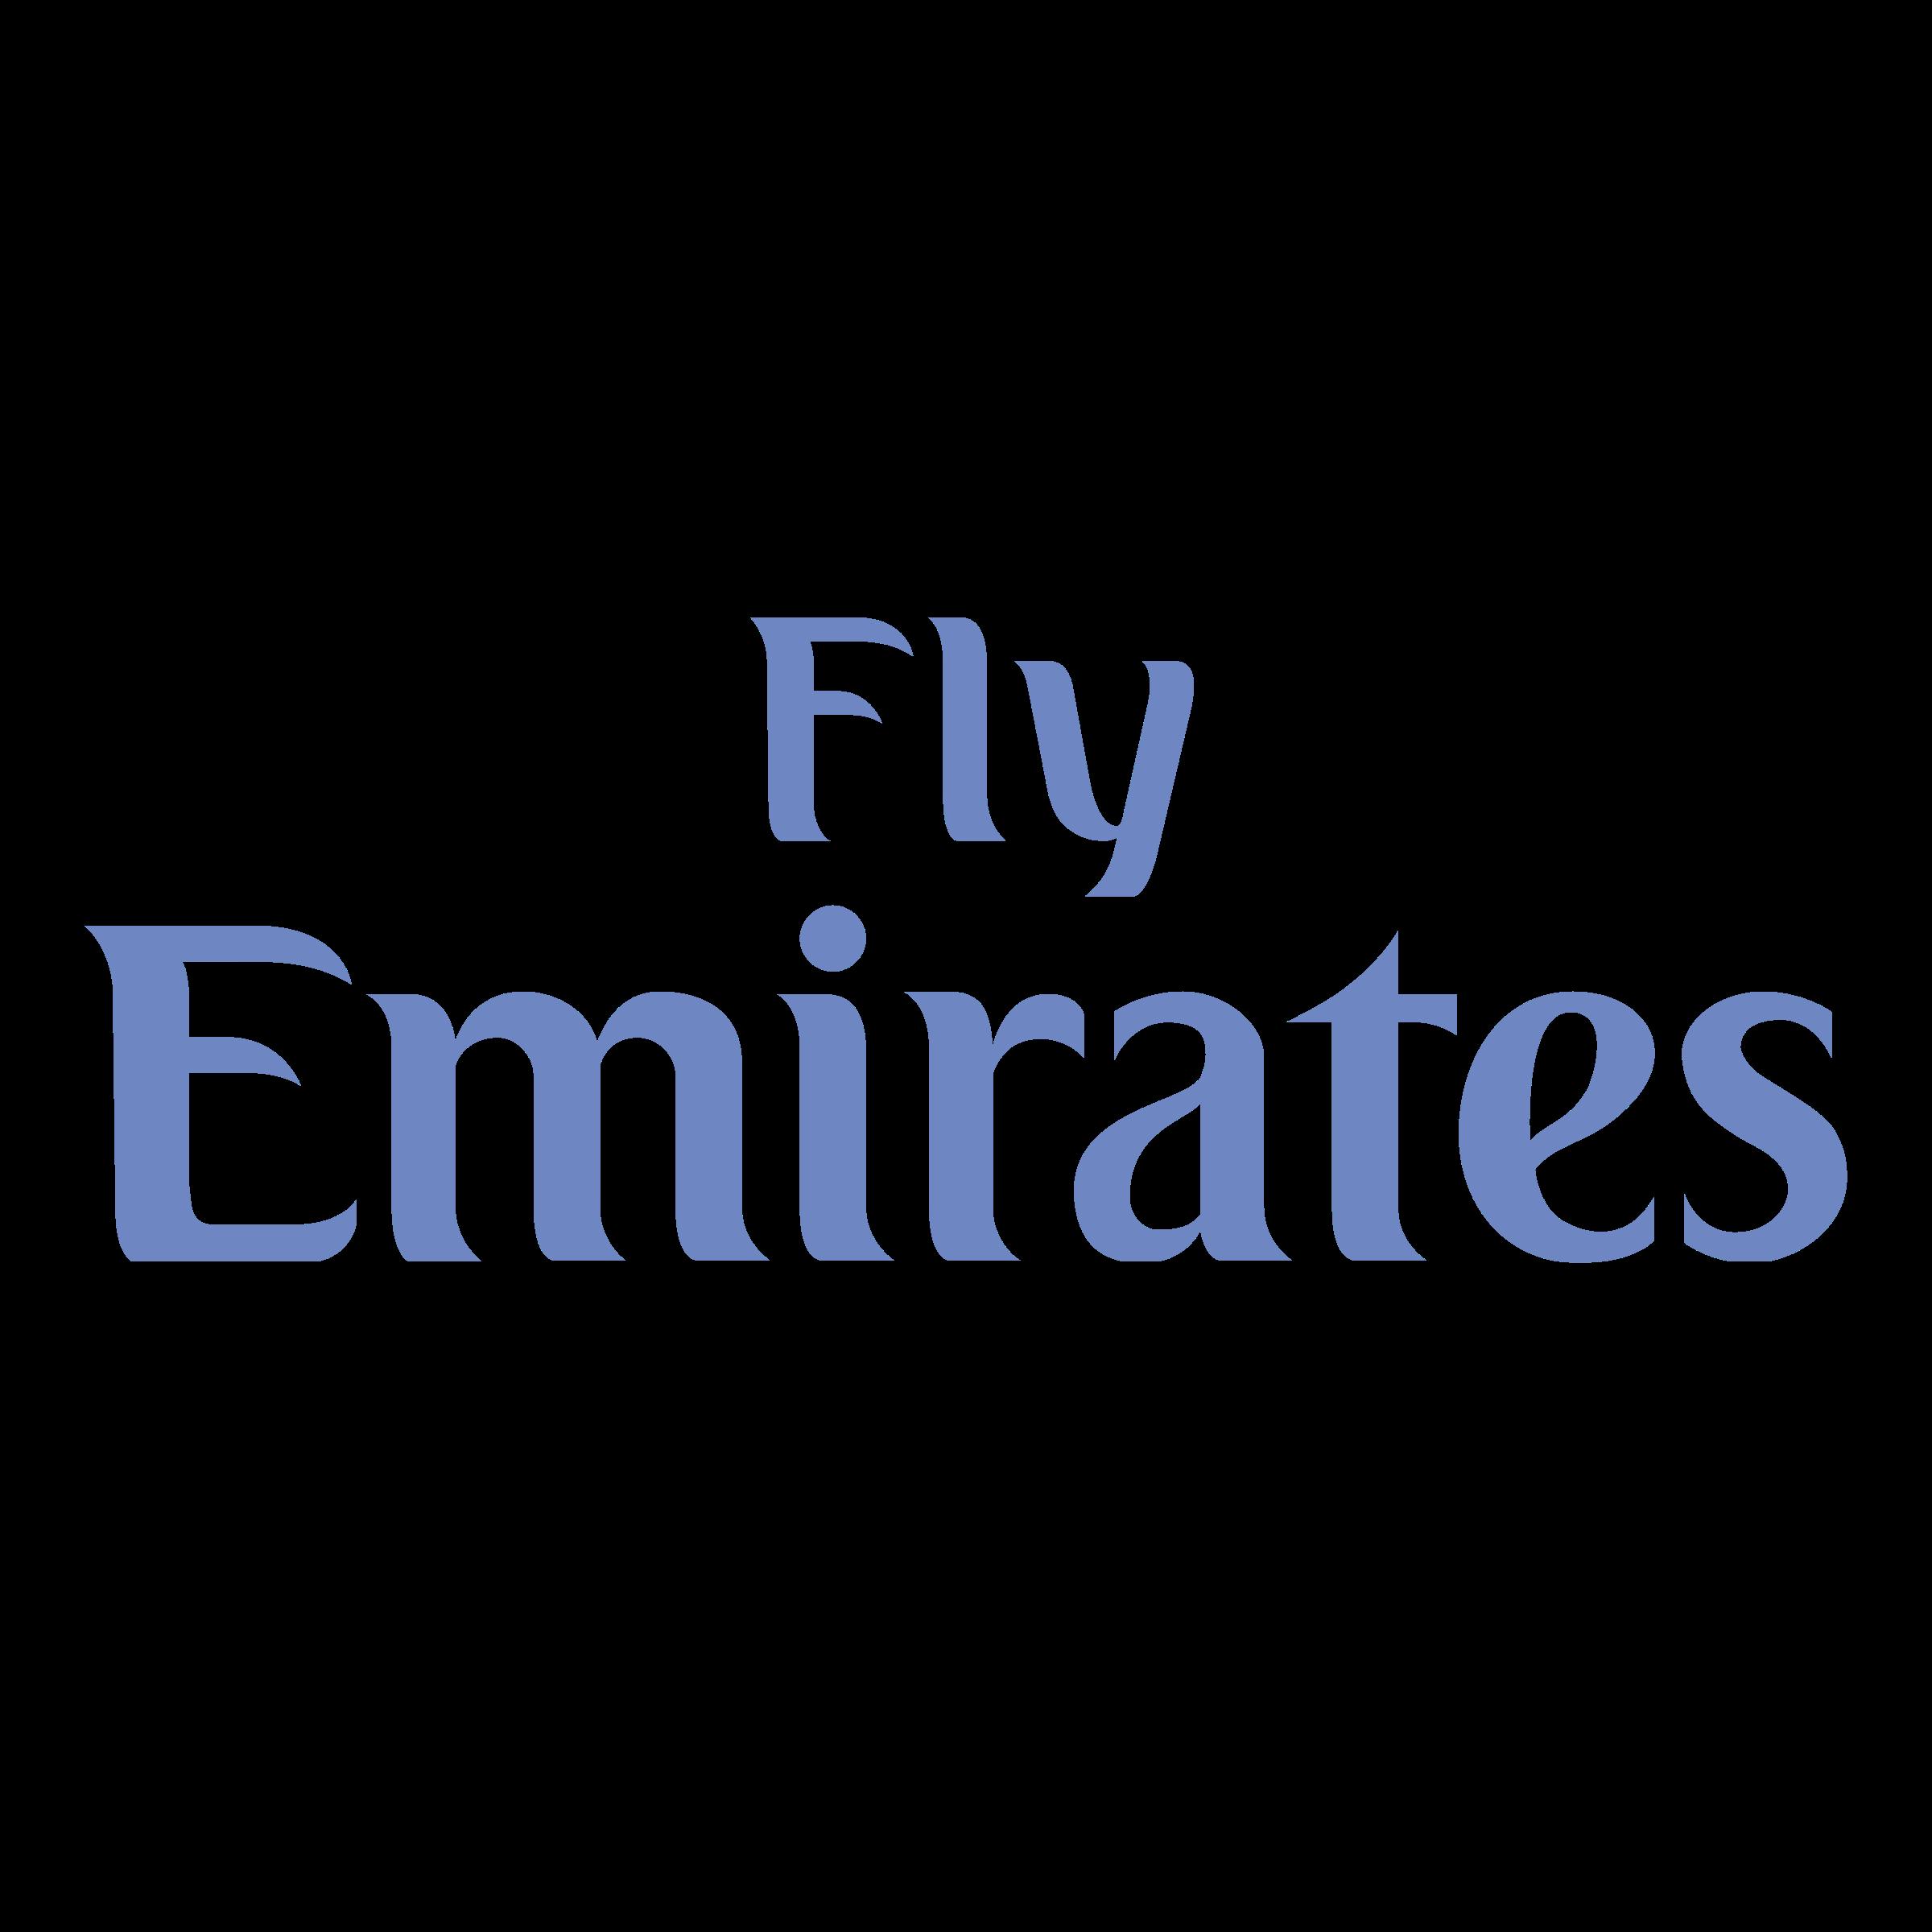 Fly Emirates Logo PNG Transparent & SVG Vector.